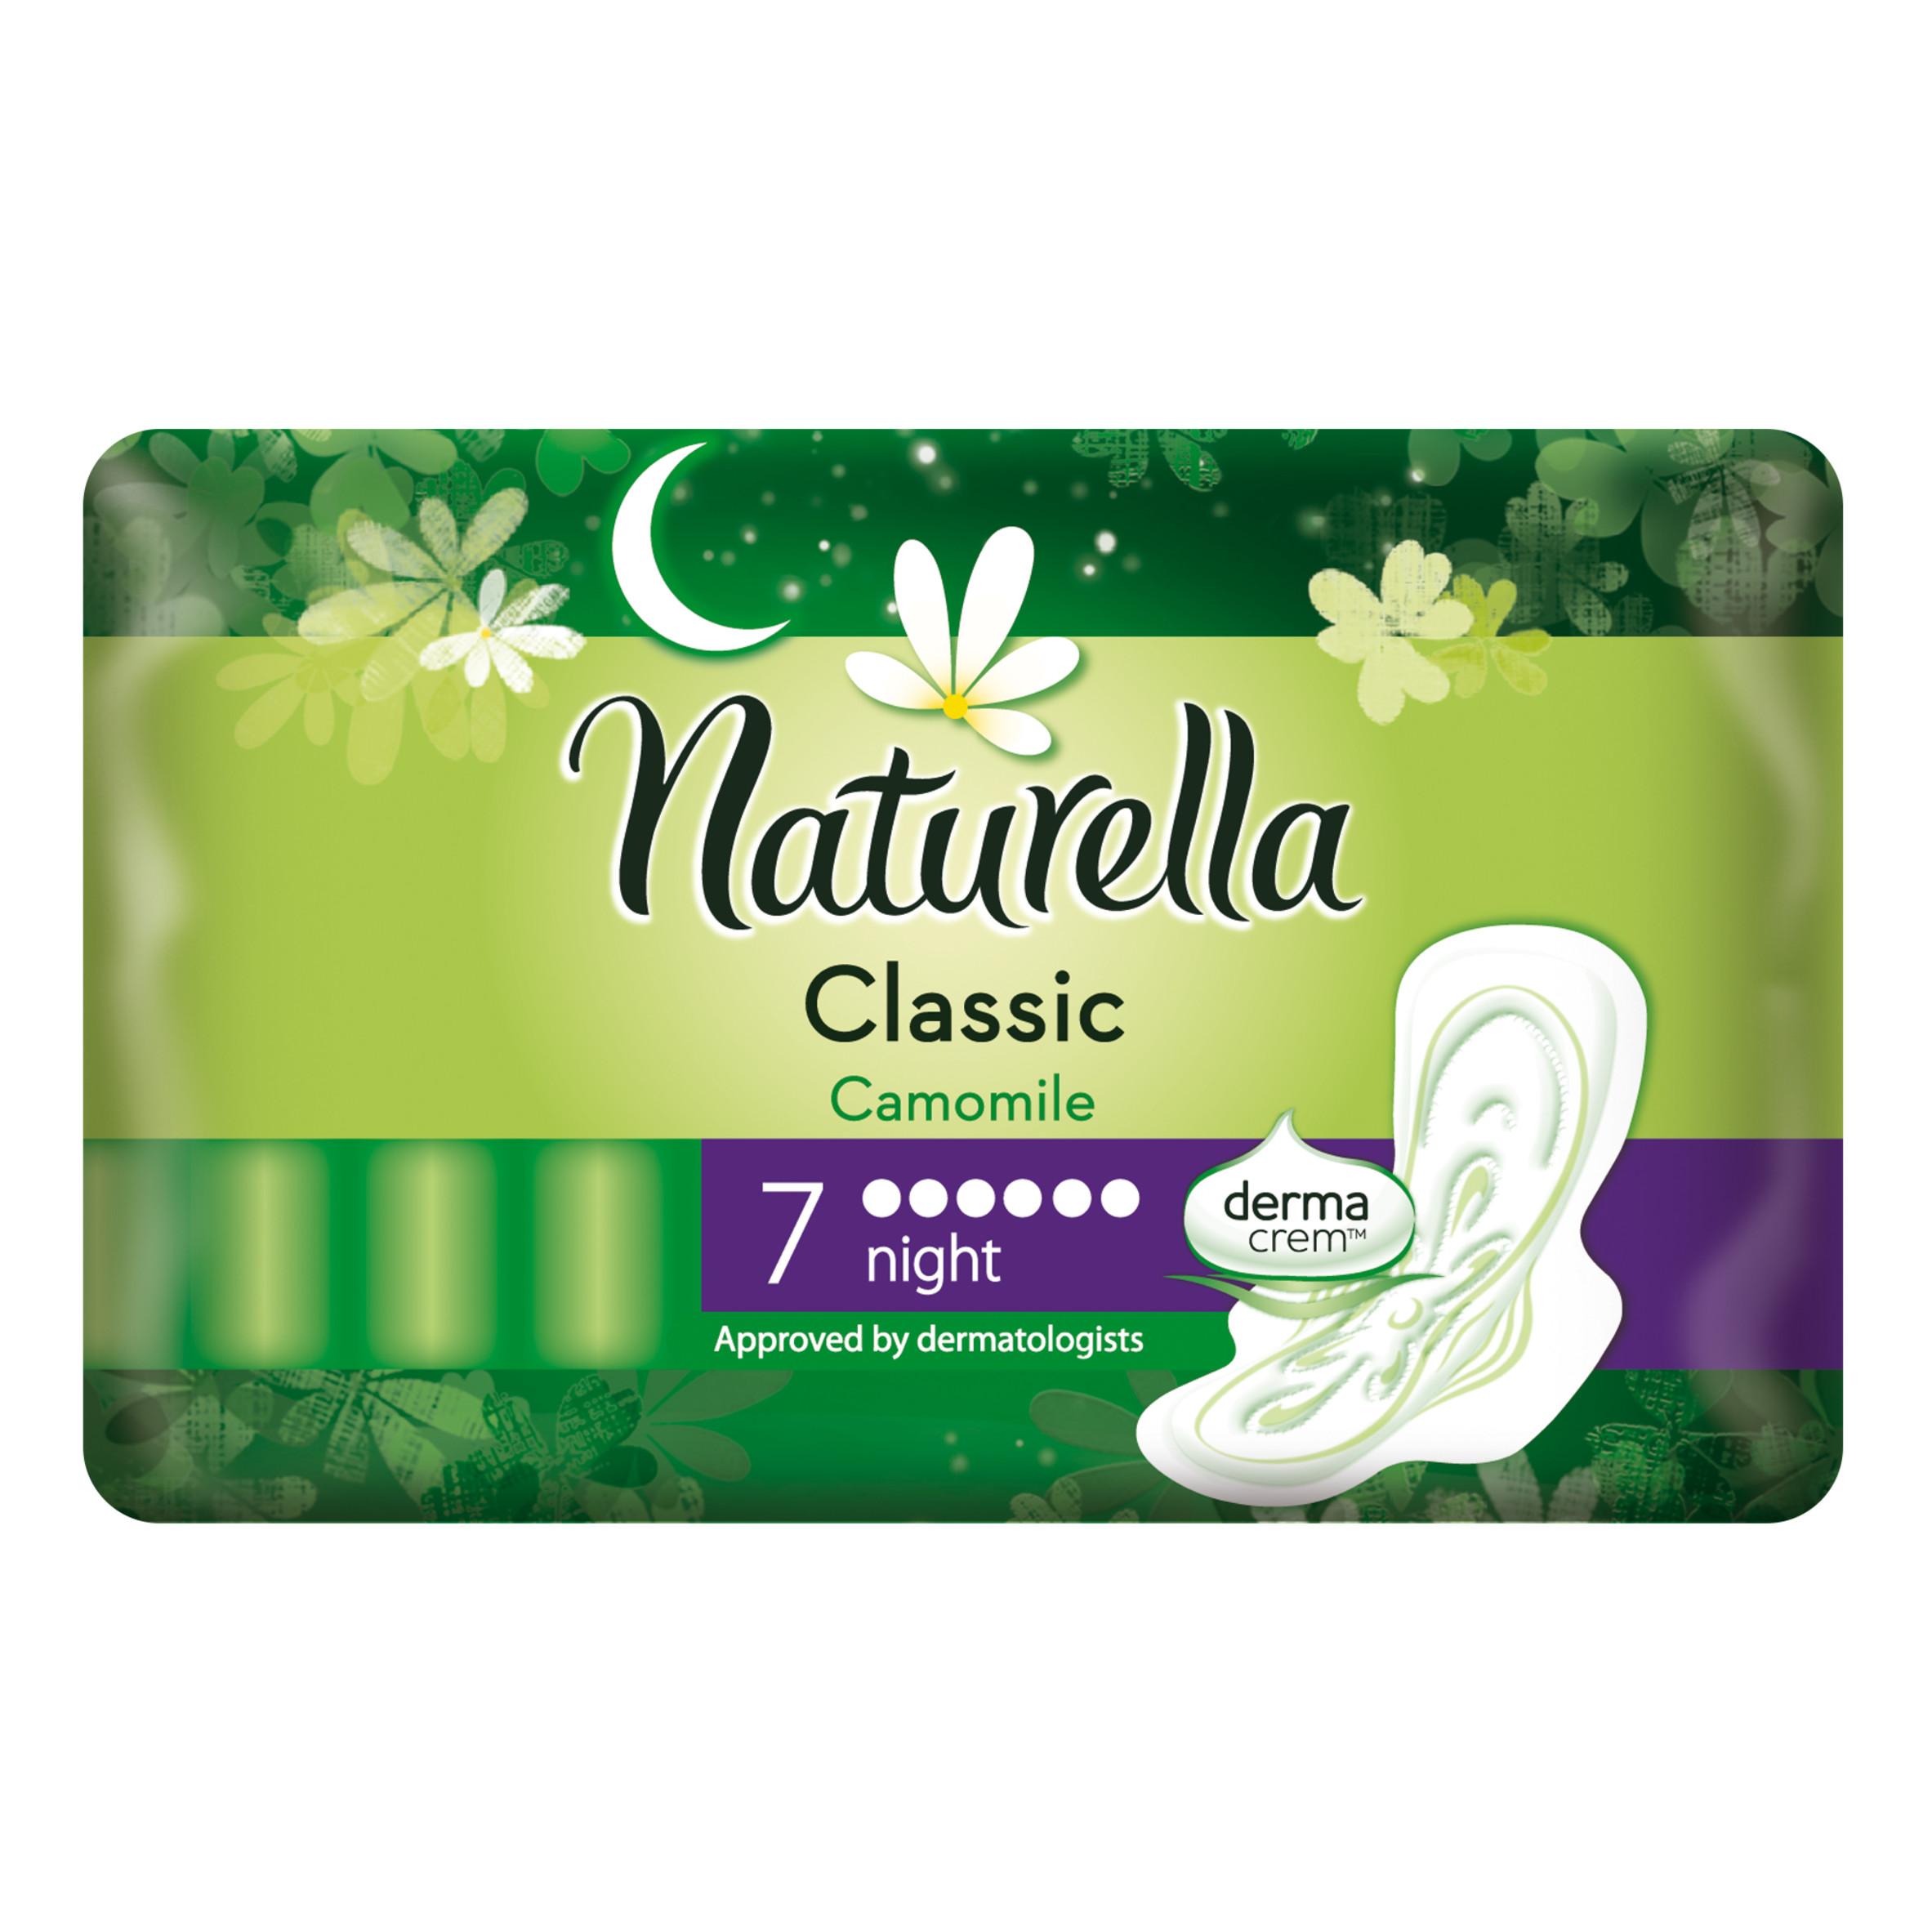 Прокладки гигиенические Naturella Classic Night Camomile 7Шт.<br>